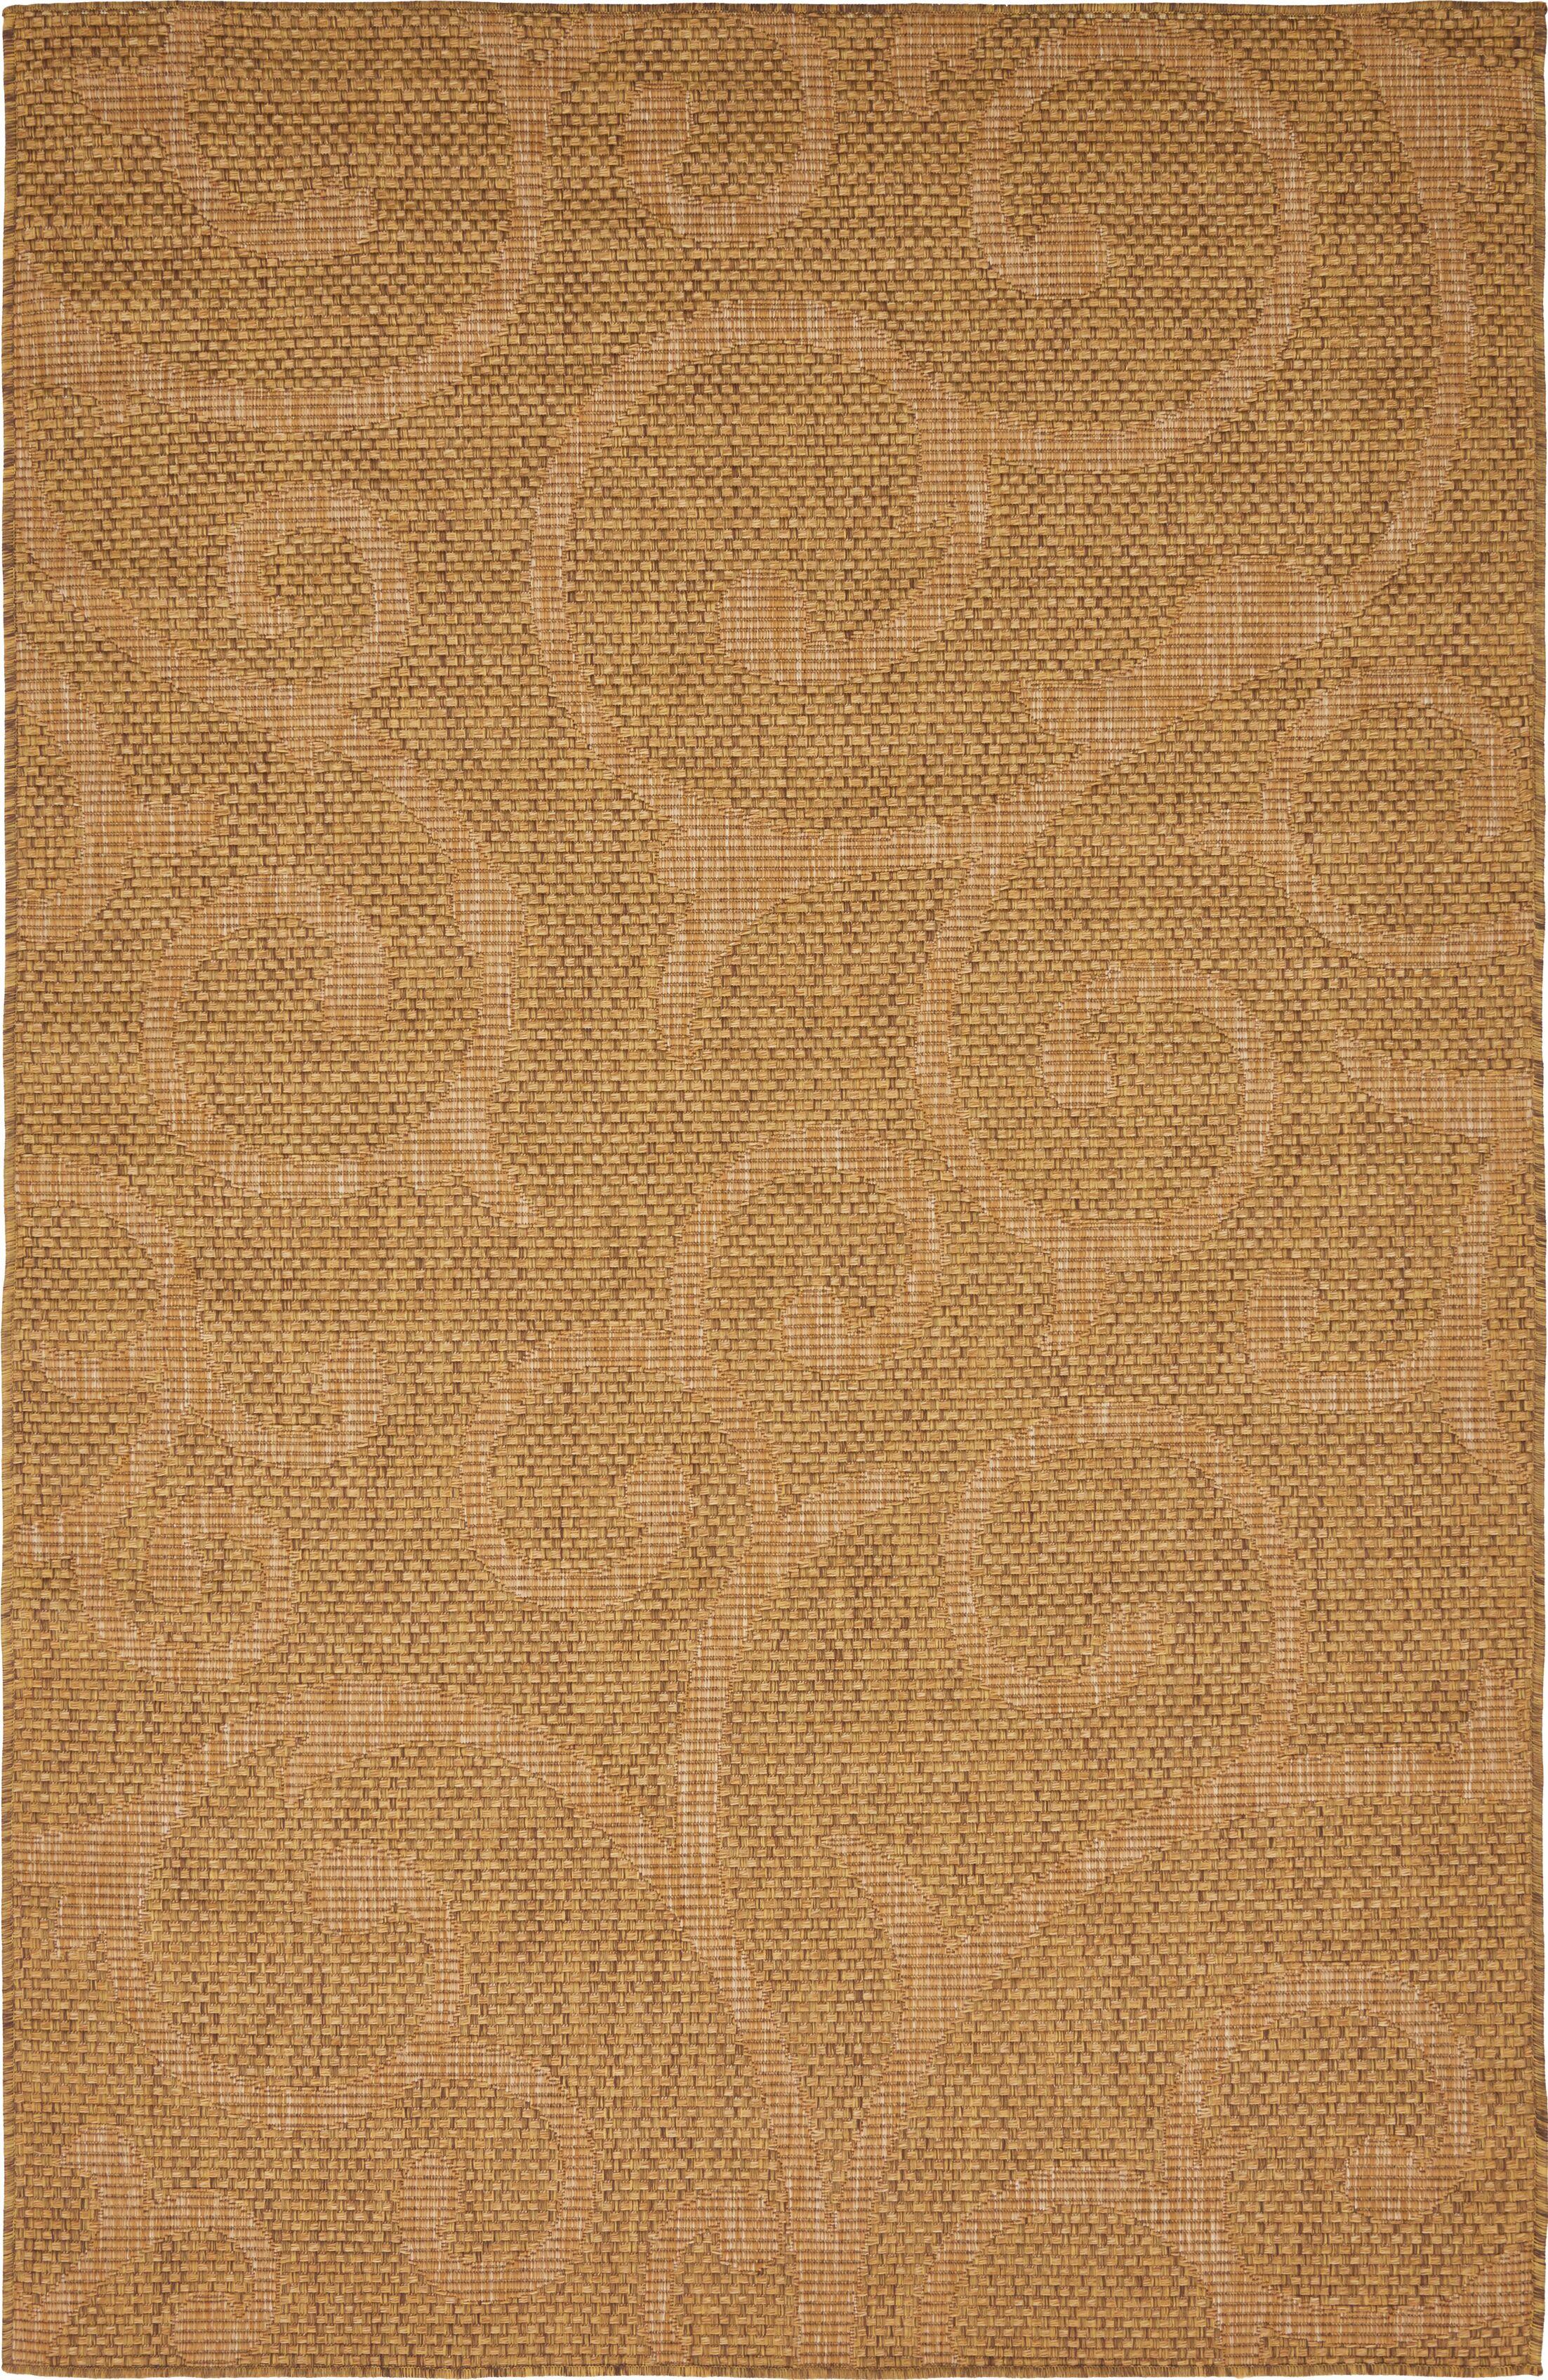 Kendari Brown Outdoor Area Rug Rug Size: Rectangle 5' x 8'